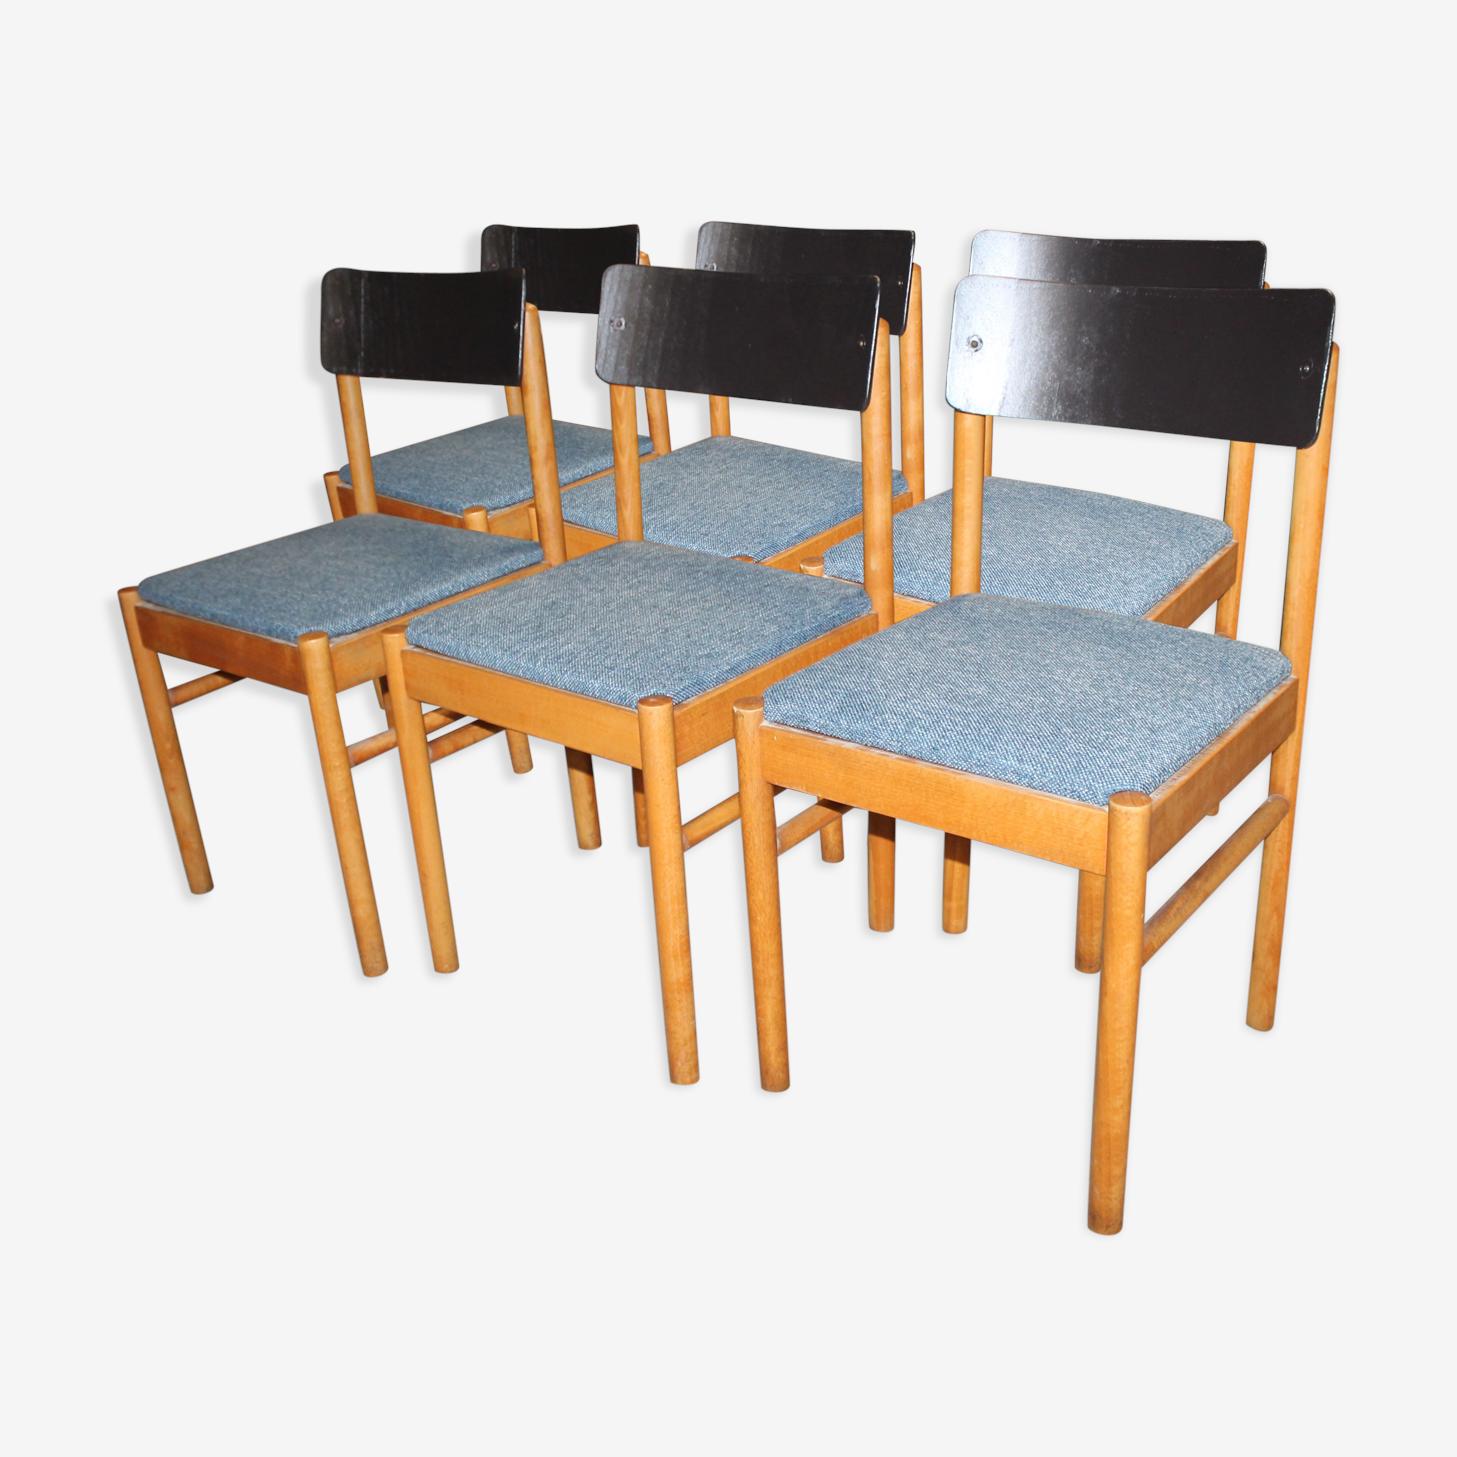 Set of six chairs Baumann model Nadia